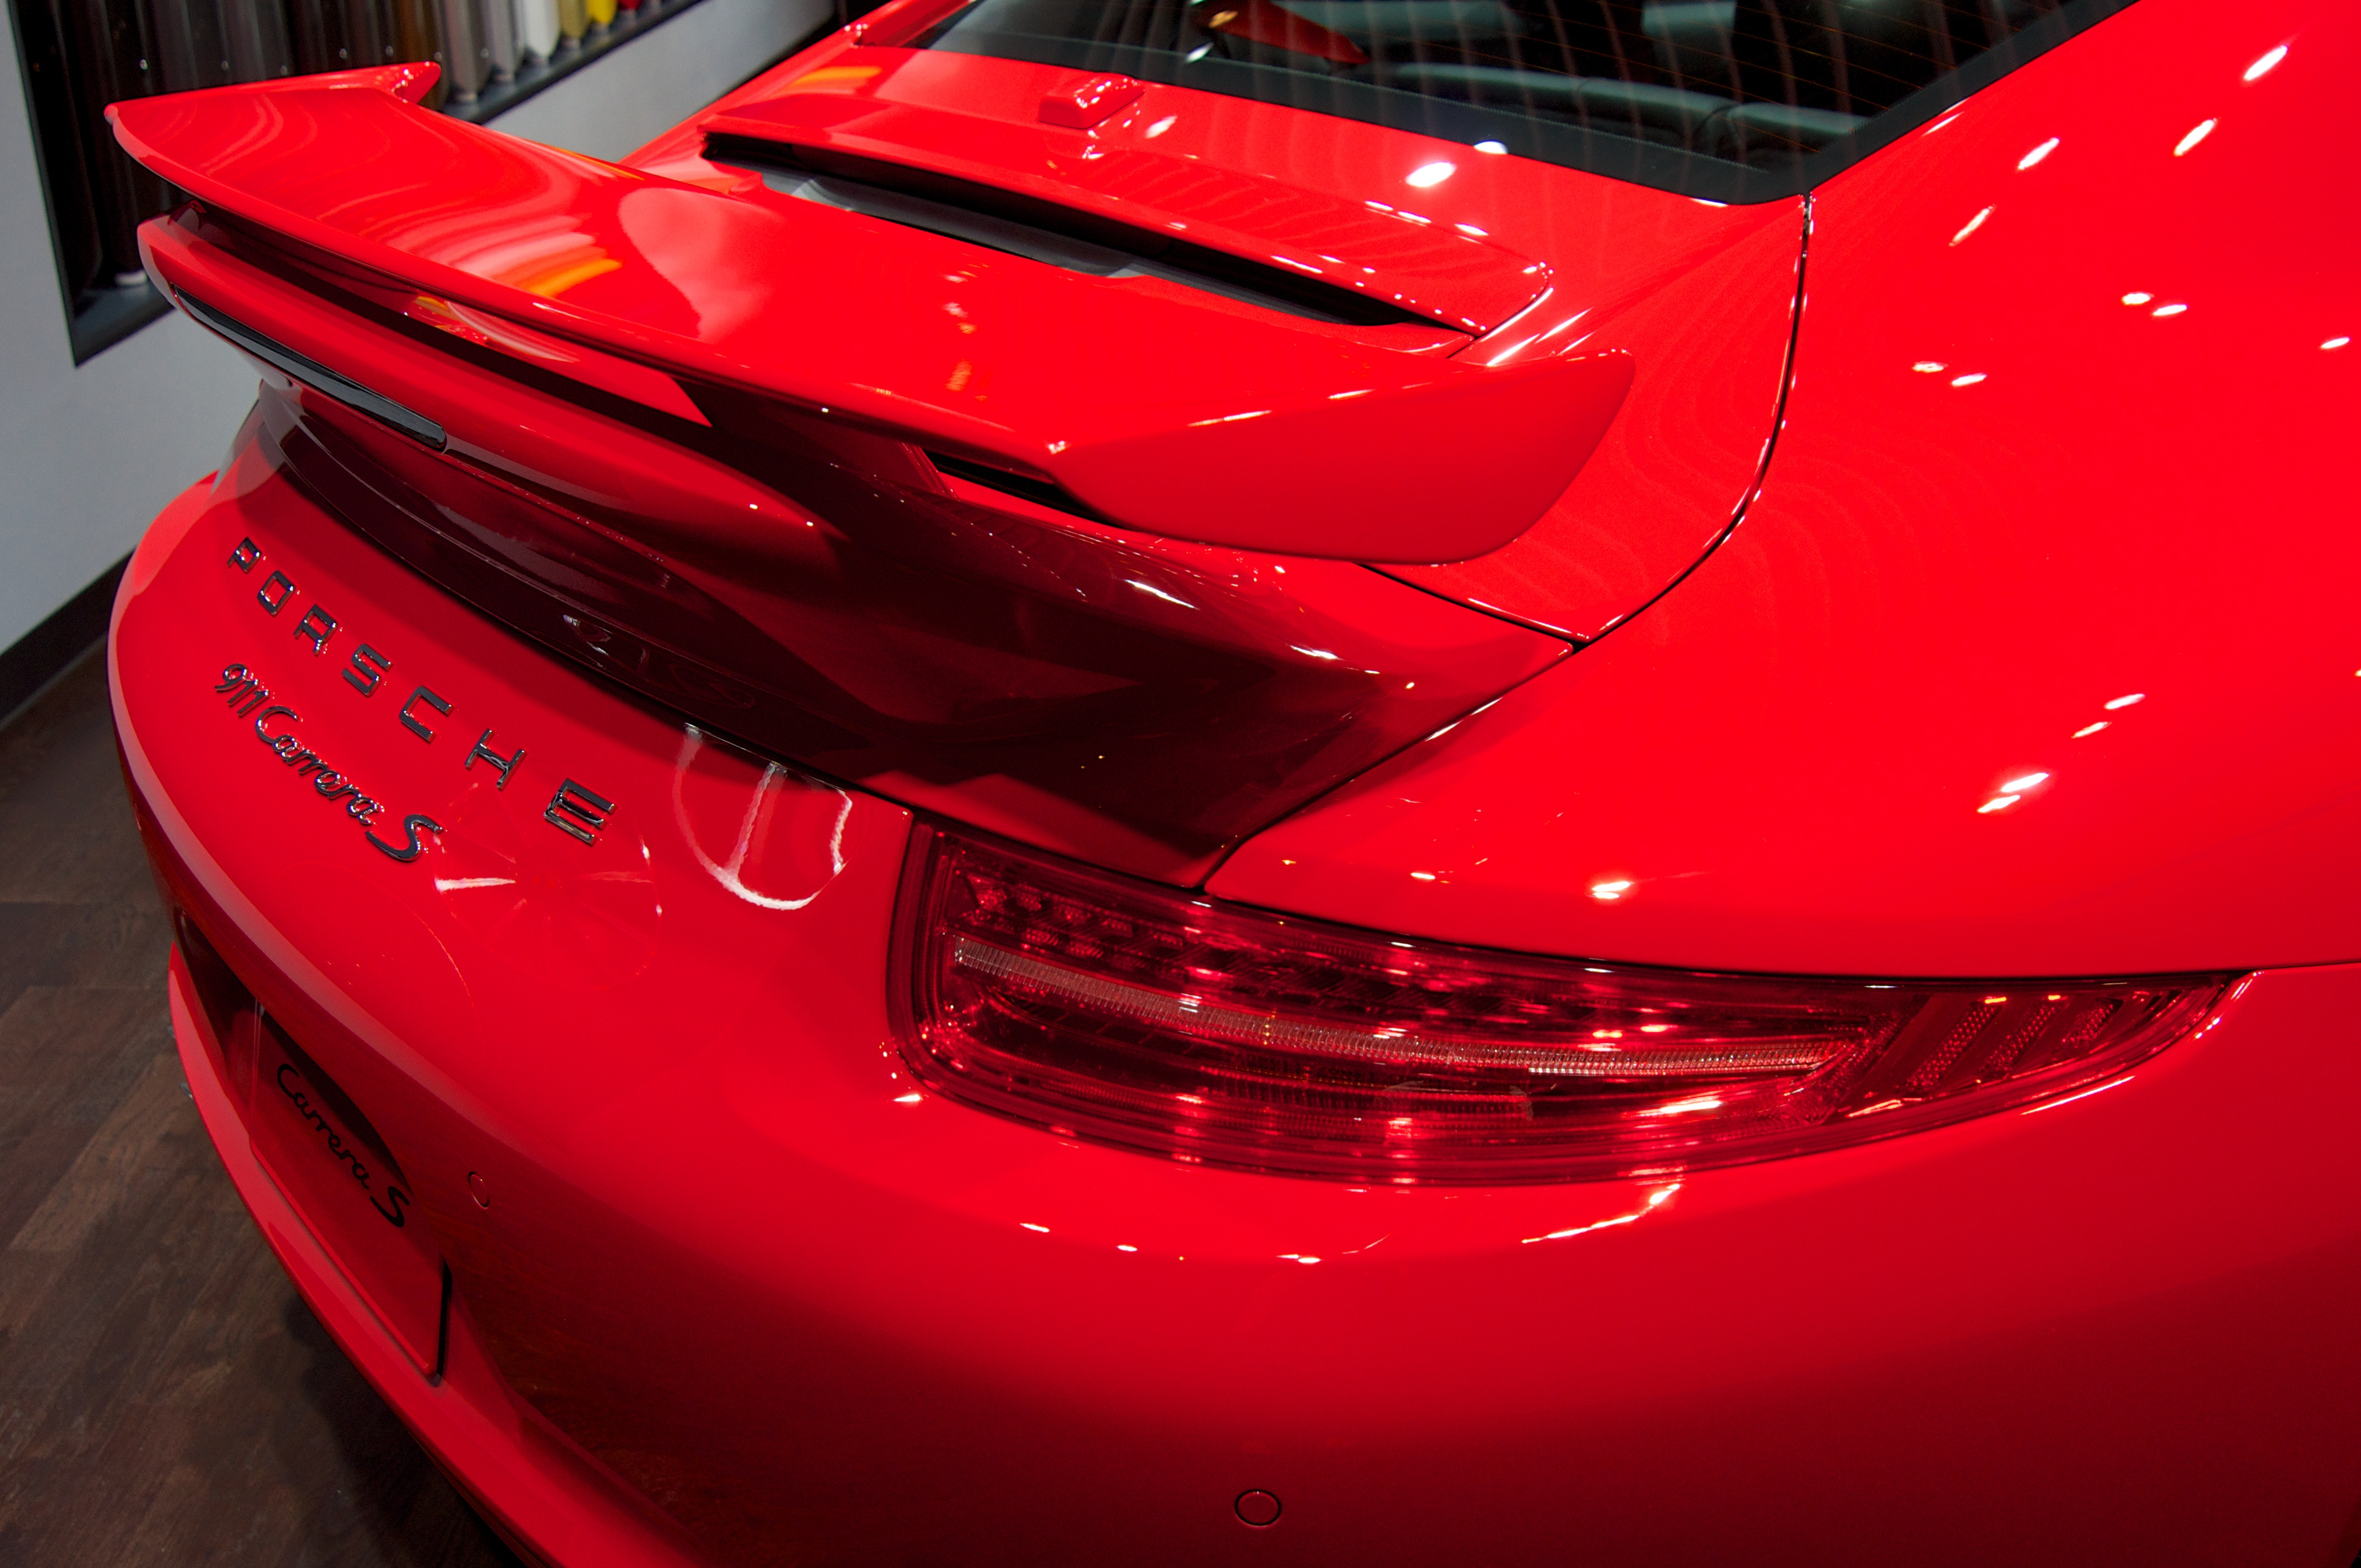 2012-porsche-911-carrera-red-2012-los-angeles-auto-show-by-stevelyon_03